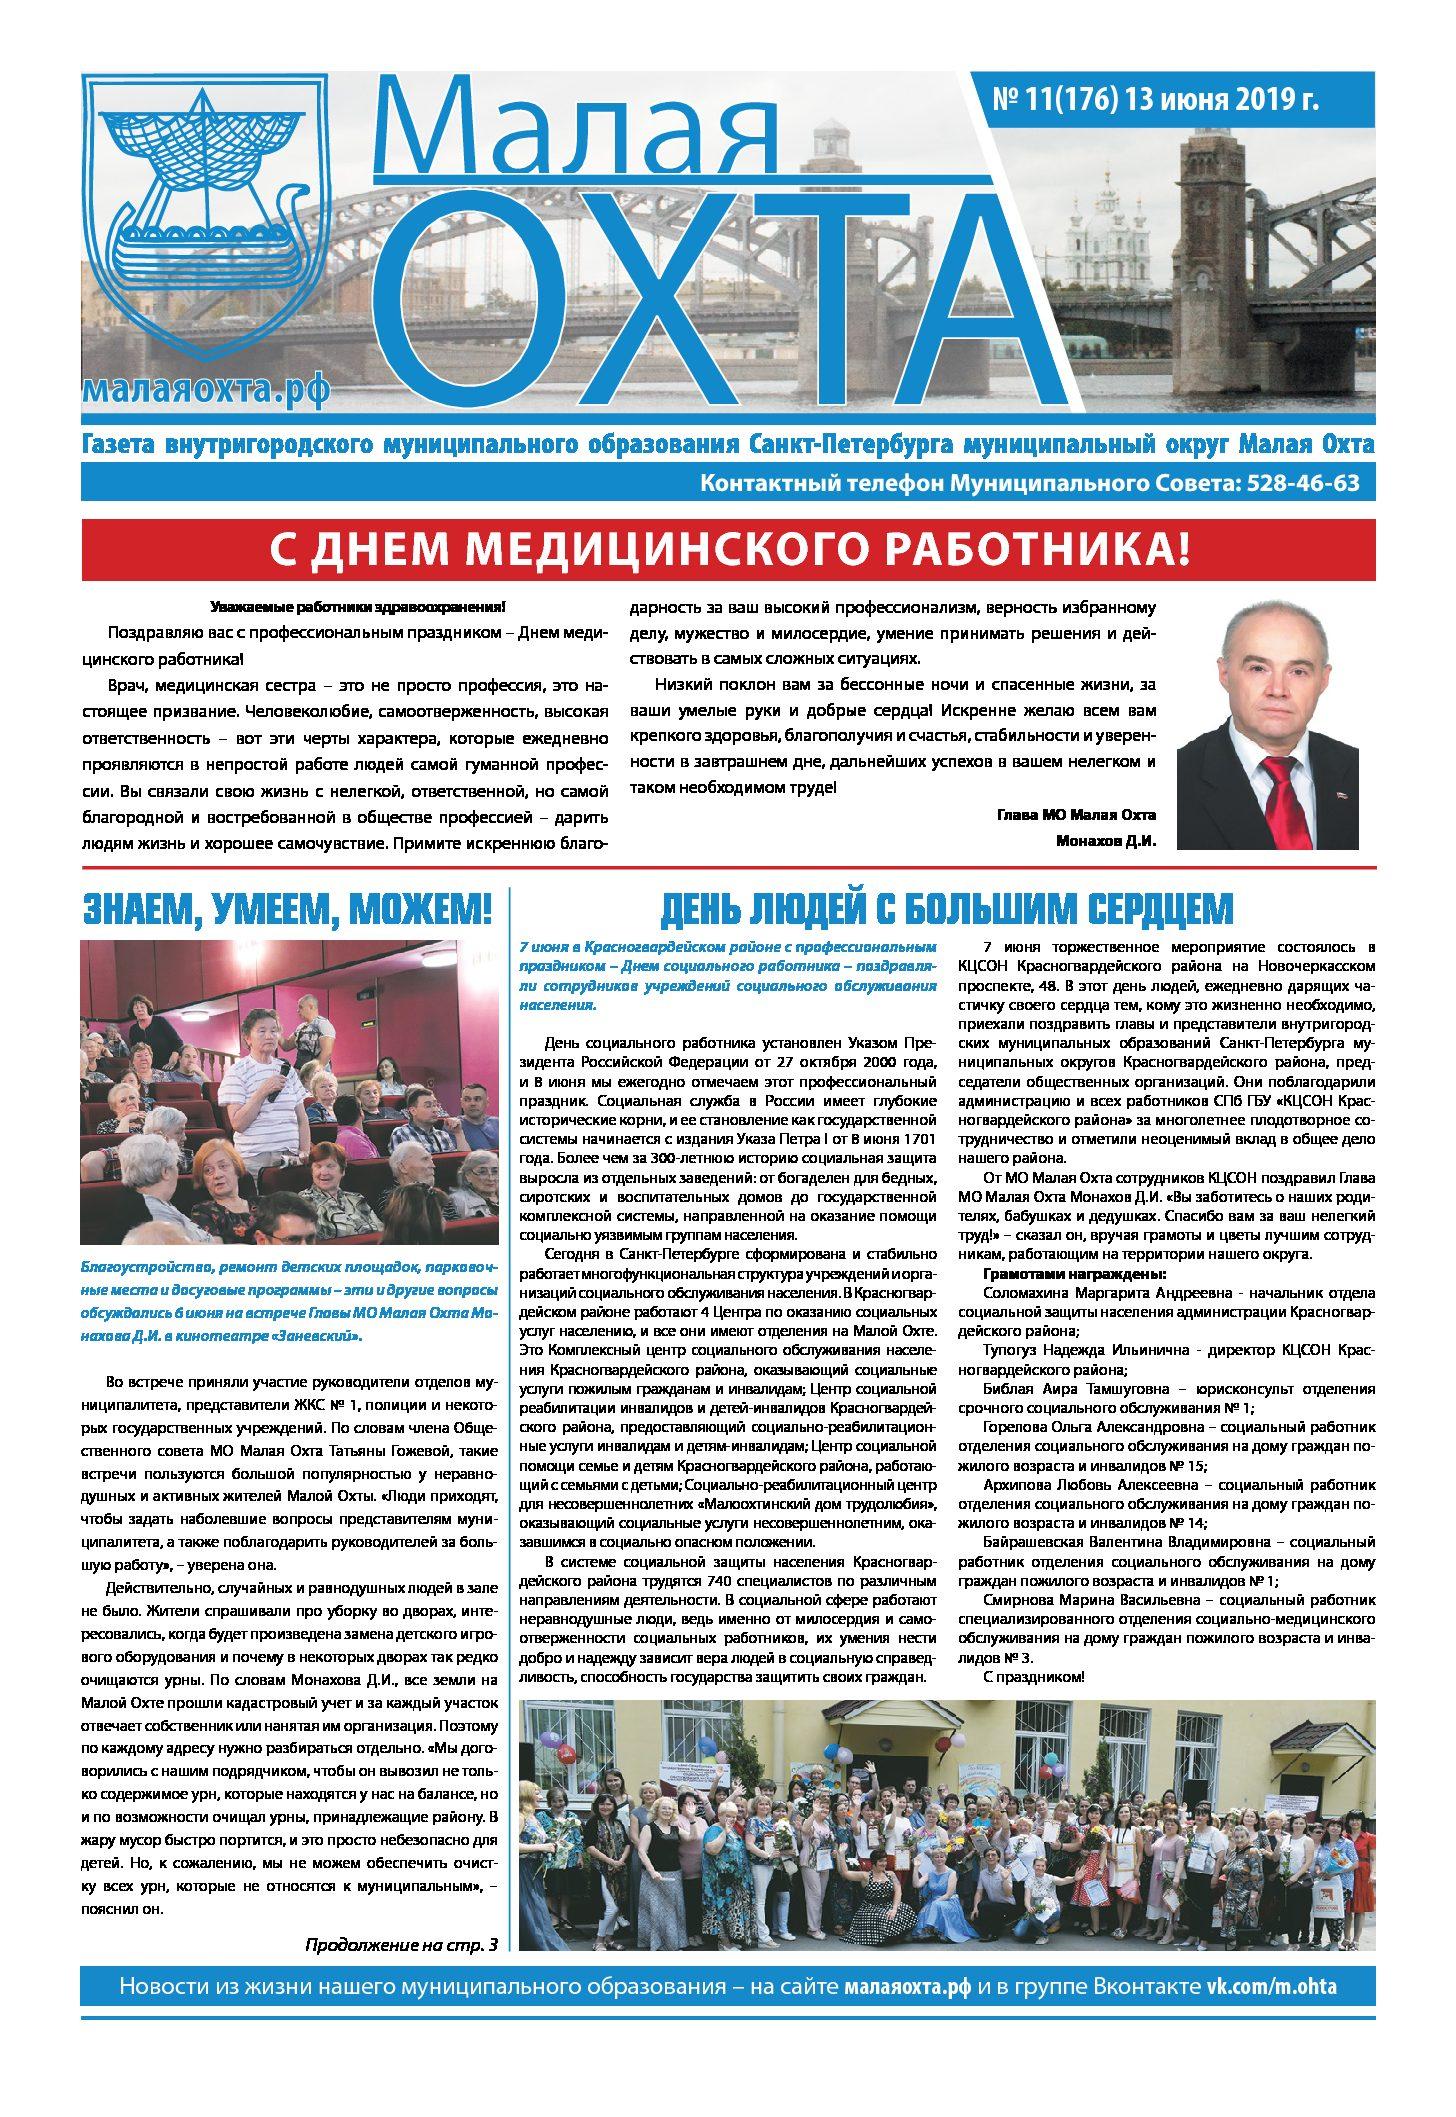 Газета №11 2019